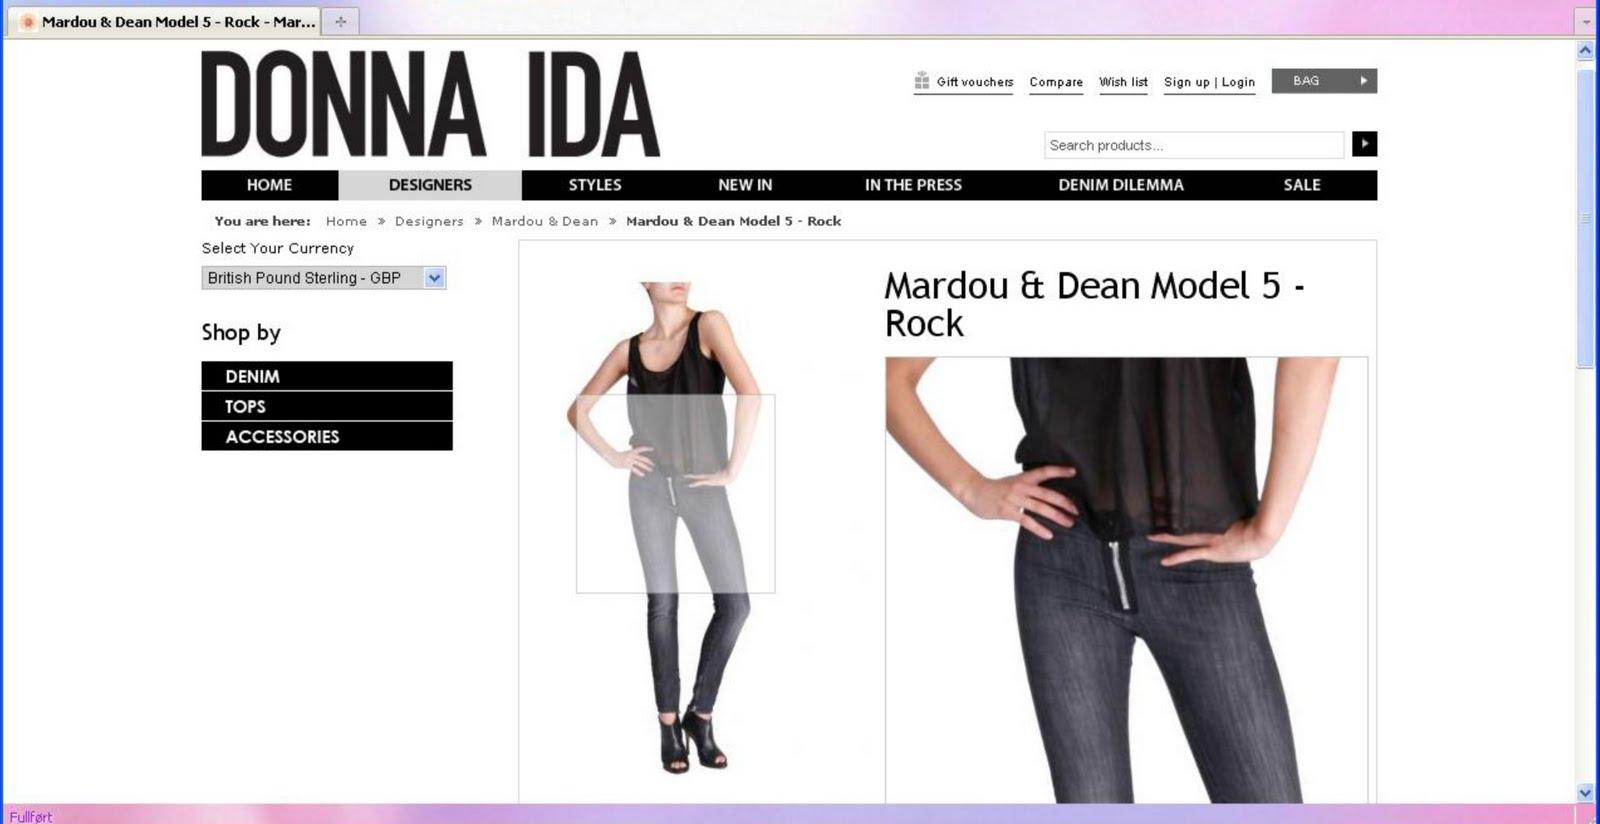 http://3.bp.blogspot.com/_Vgs7lkwqDAU/S7dnPdOAjmI/AAAAAAAABss/S7DrlrguMOA/s1600/donna+ida+shopping-2.jpg